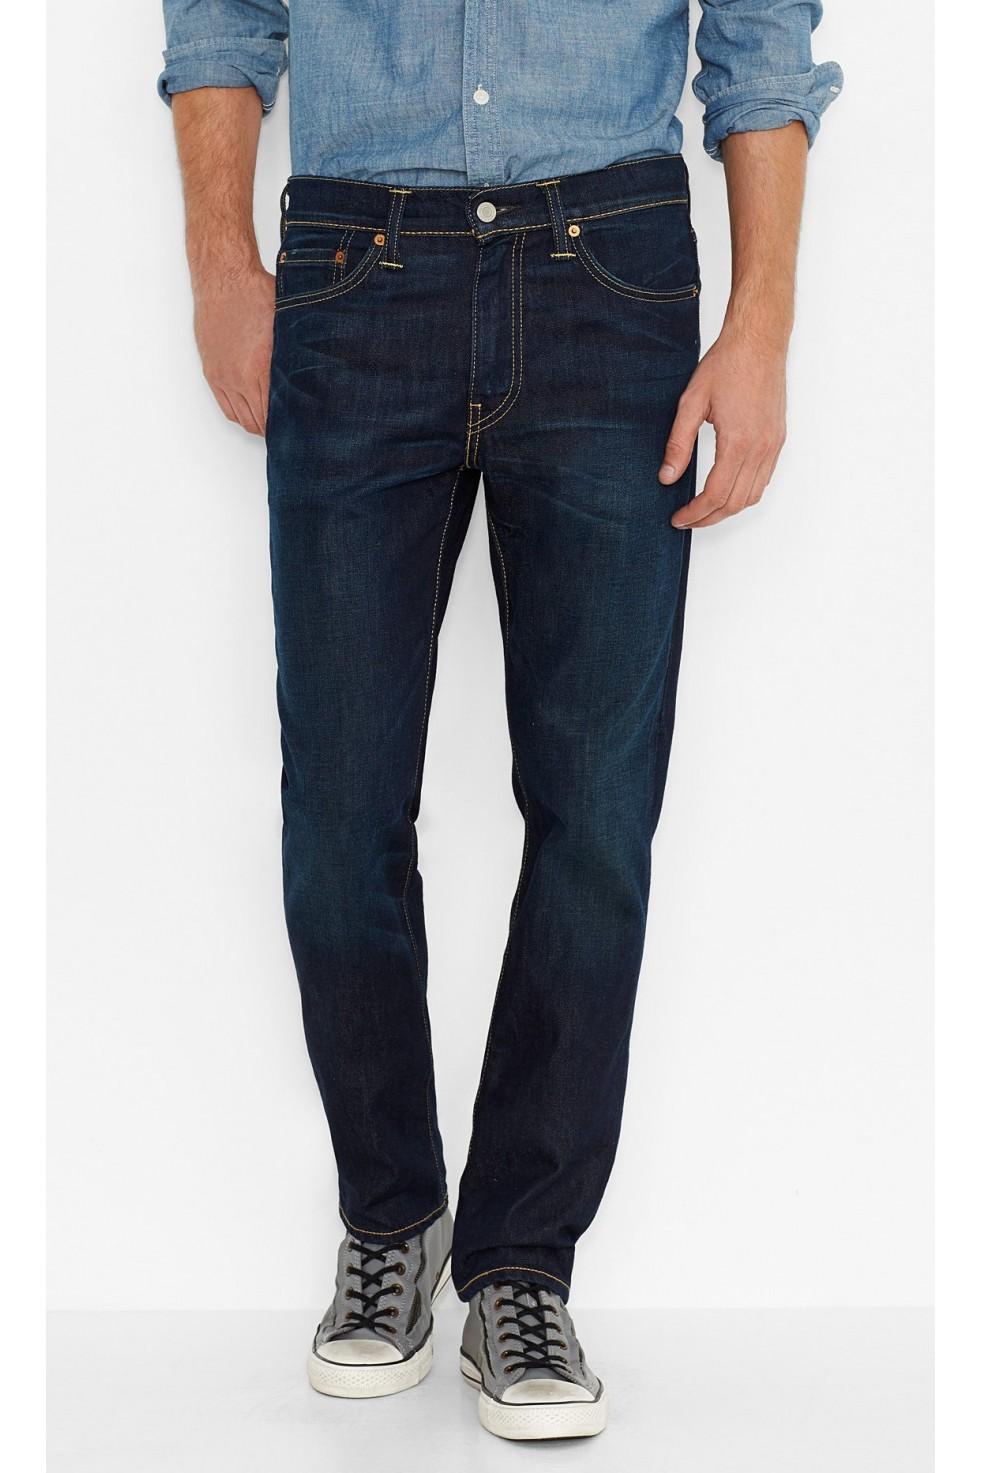 Levis Erkek Jean Pantolon 511 Slim Fıt 04511-1542